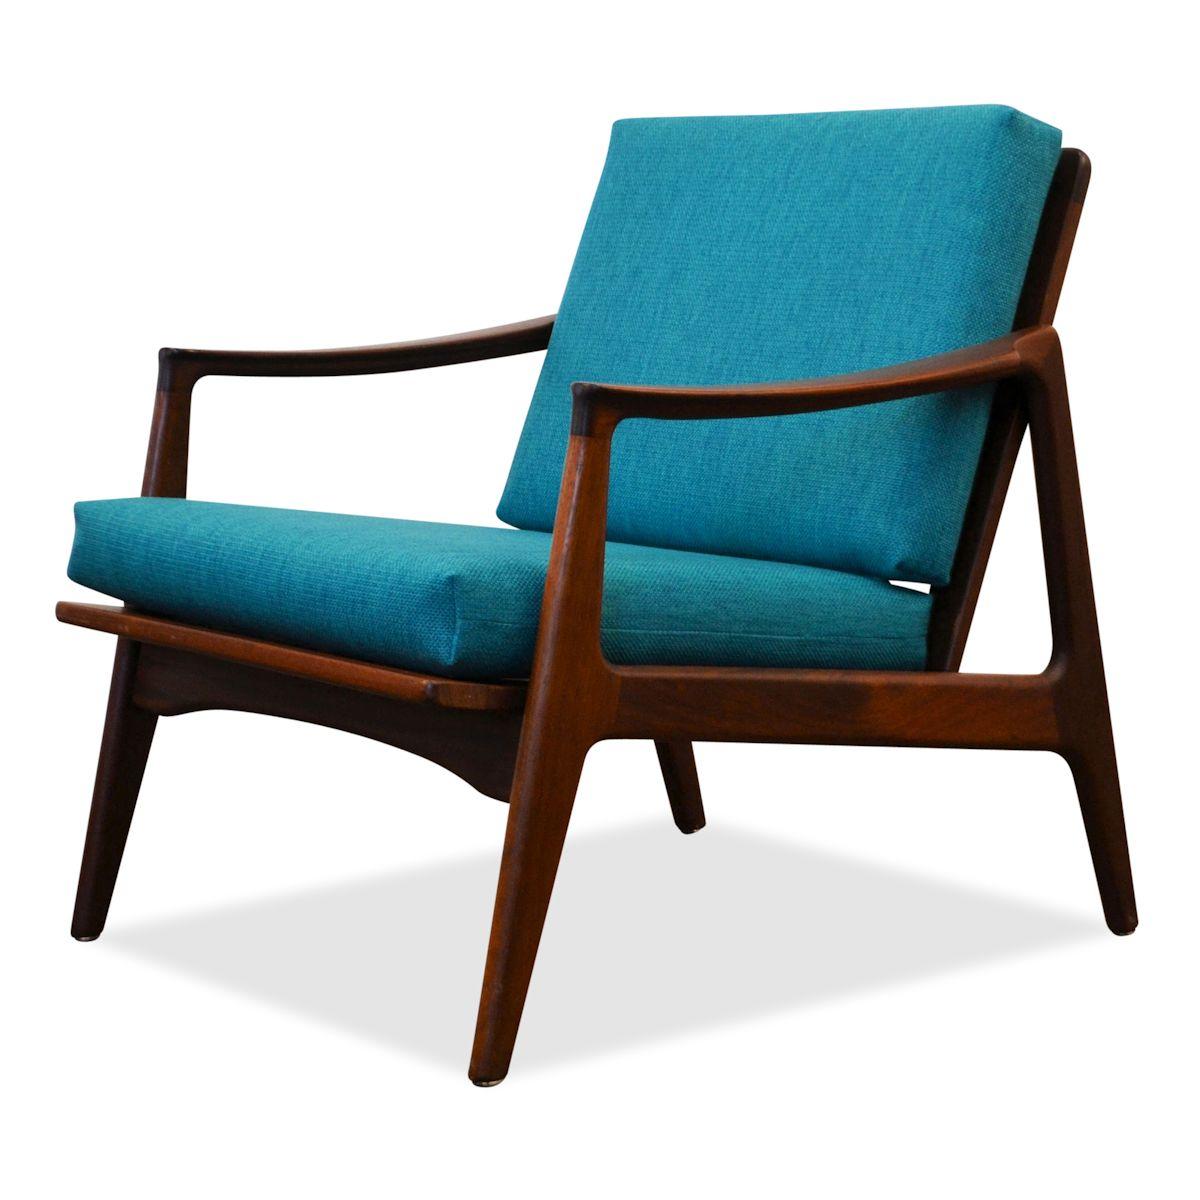 Vintage Deens design teak fauteuil